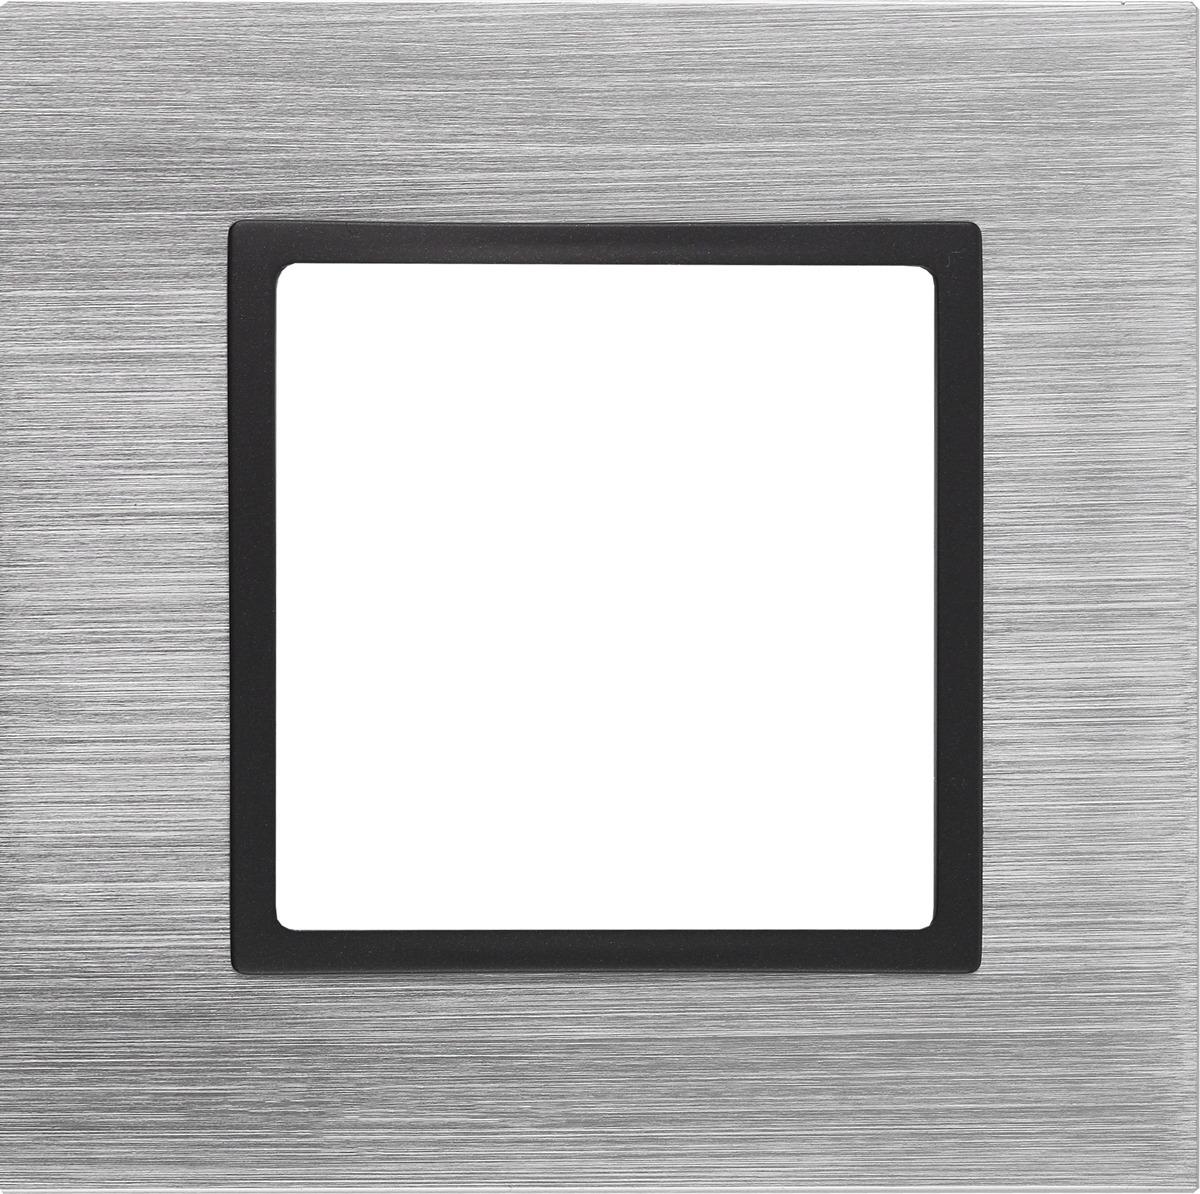 Рамка электроустановочная ЭРА Elegance, на 1 пост, 14-5201-41, стальной simon simon 82 nature сталь матовая графит металл рамка на 1 пост 82817 31